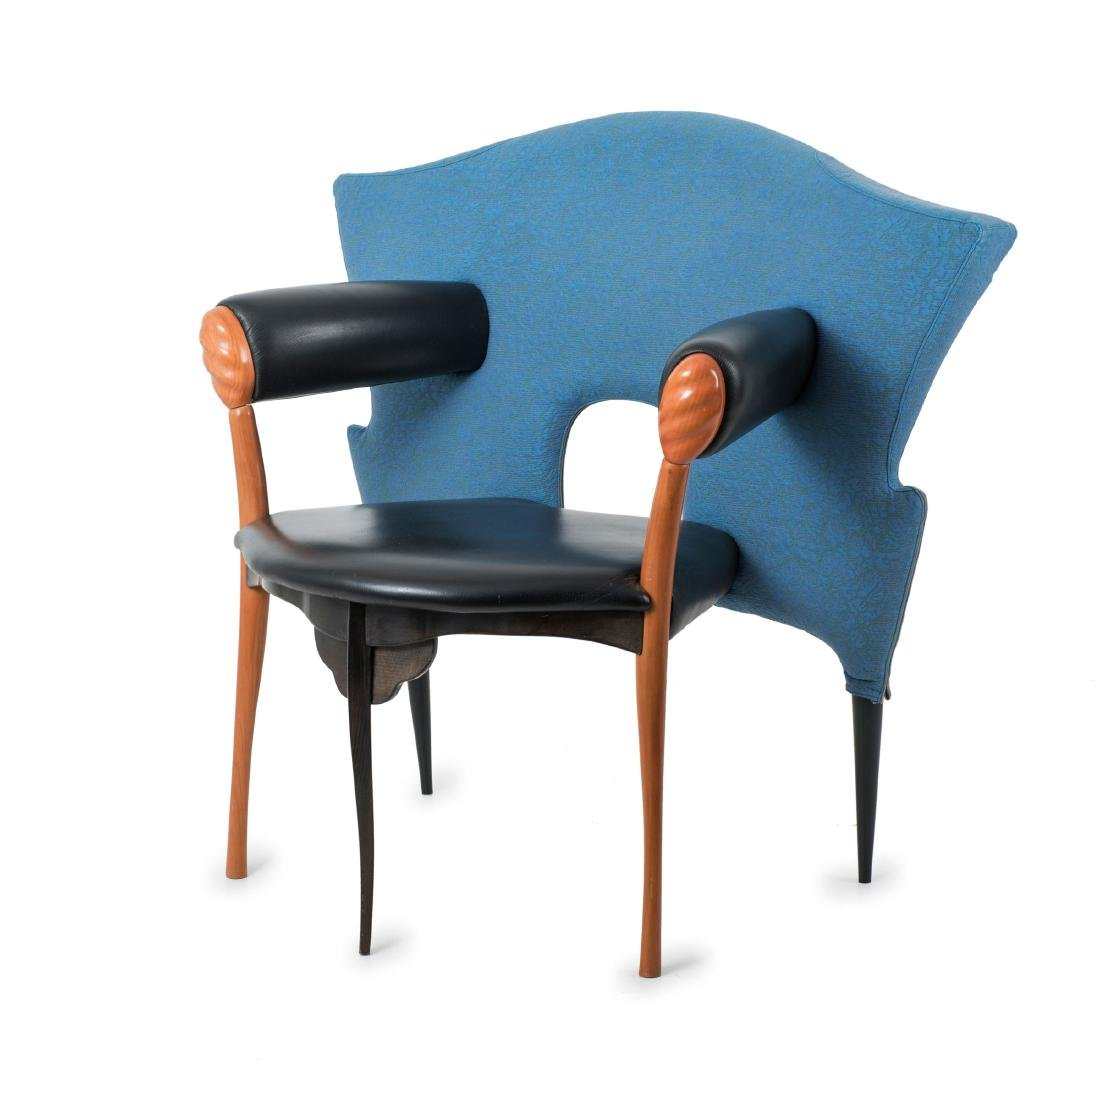 'Papillon' chair - 'Prosim Sedni', 1987